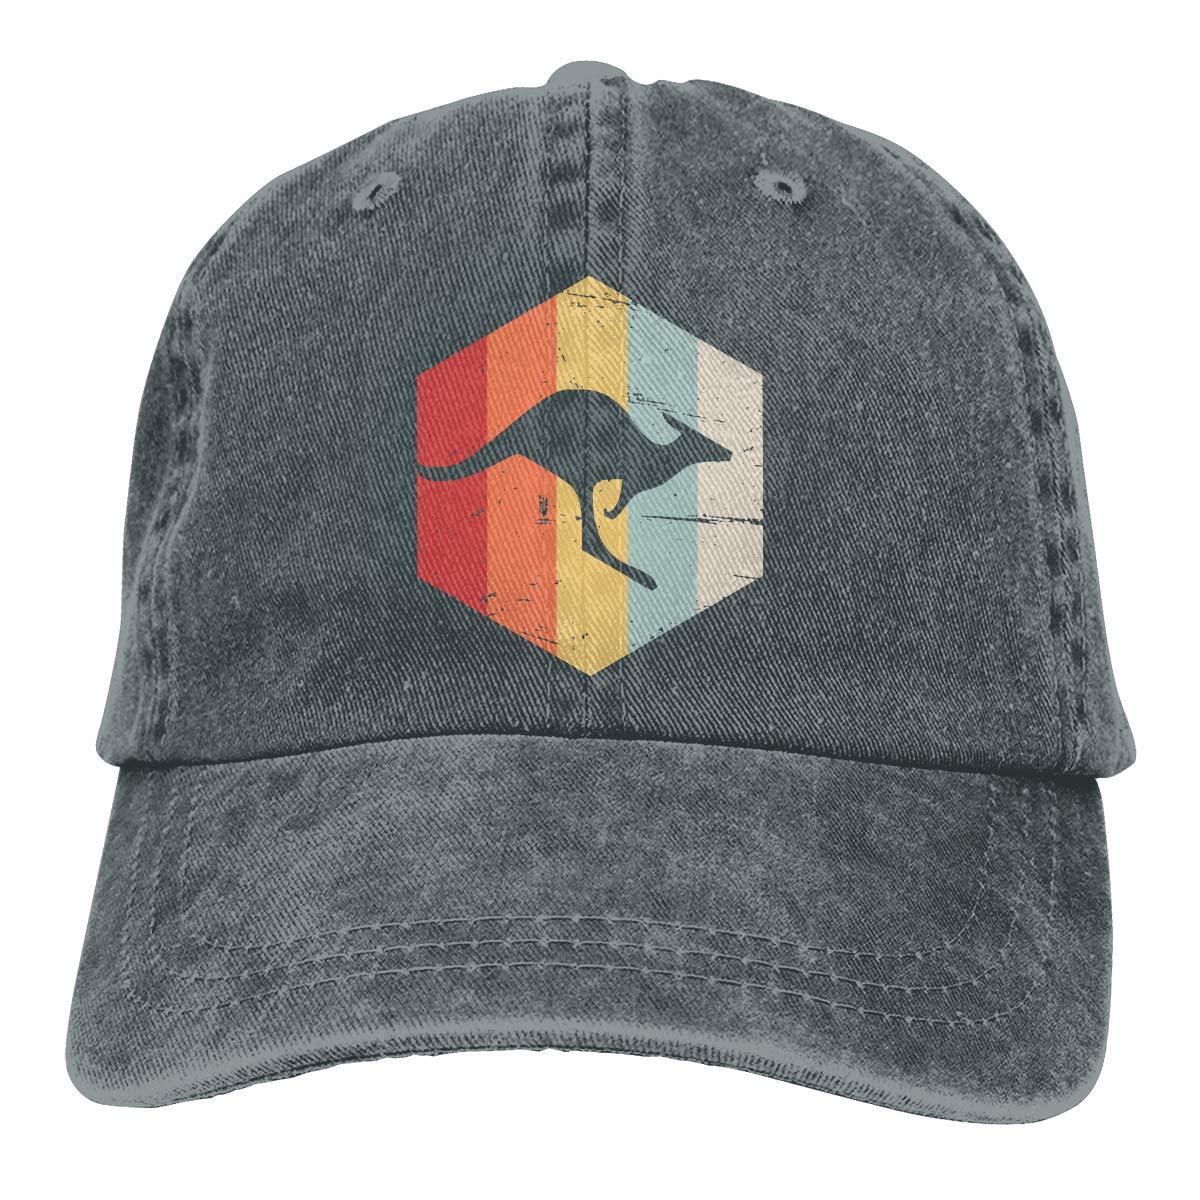 Retro 70s Kangaroo Vintage Mens Womens Adjustable Denim Baseball Cap Sun Hat